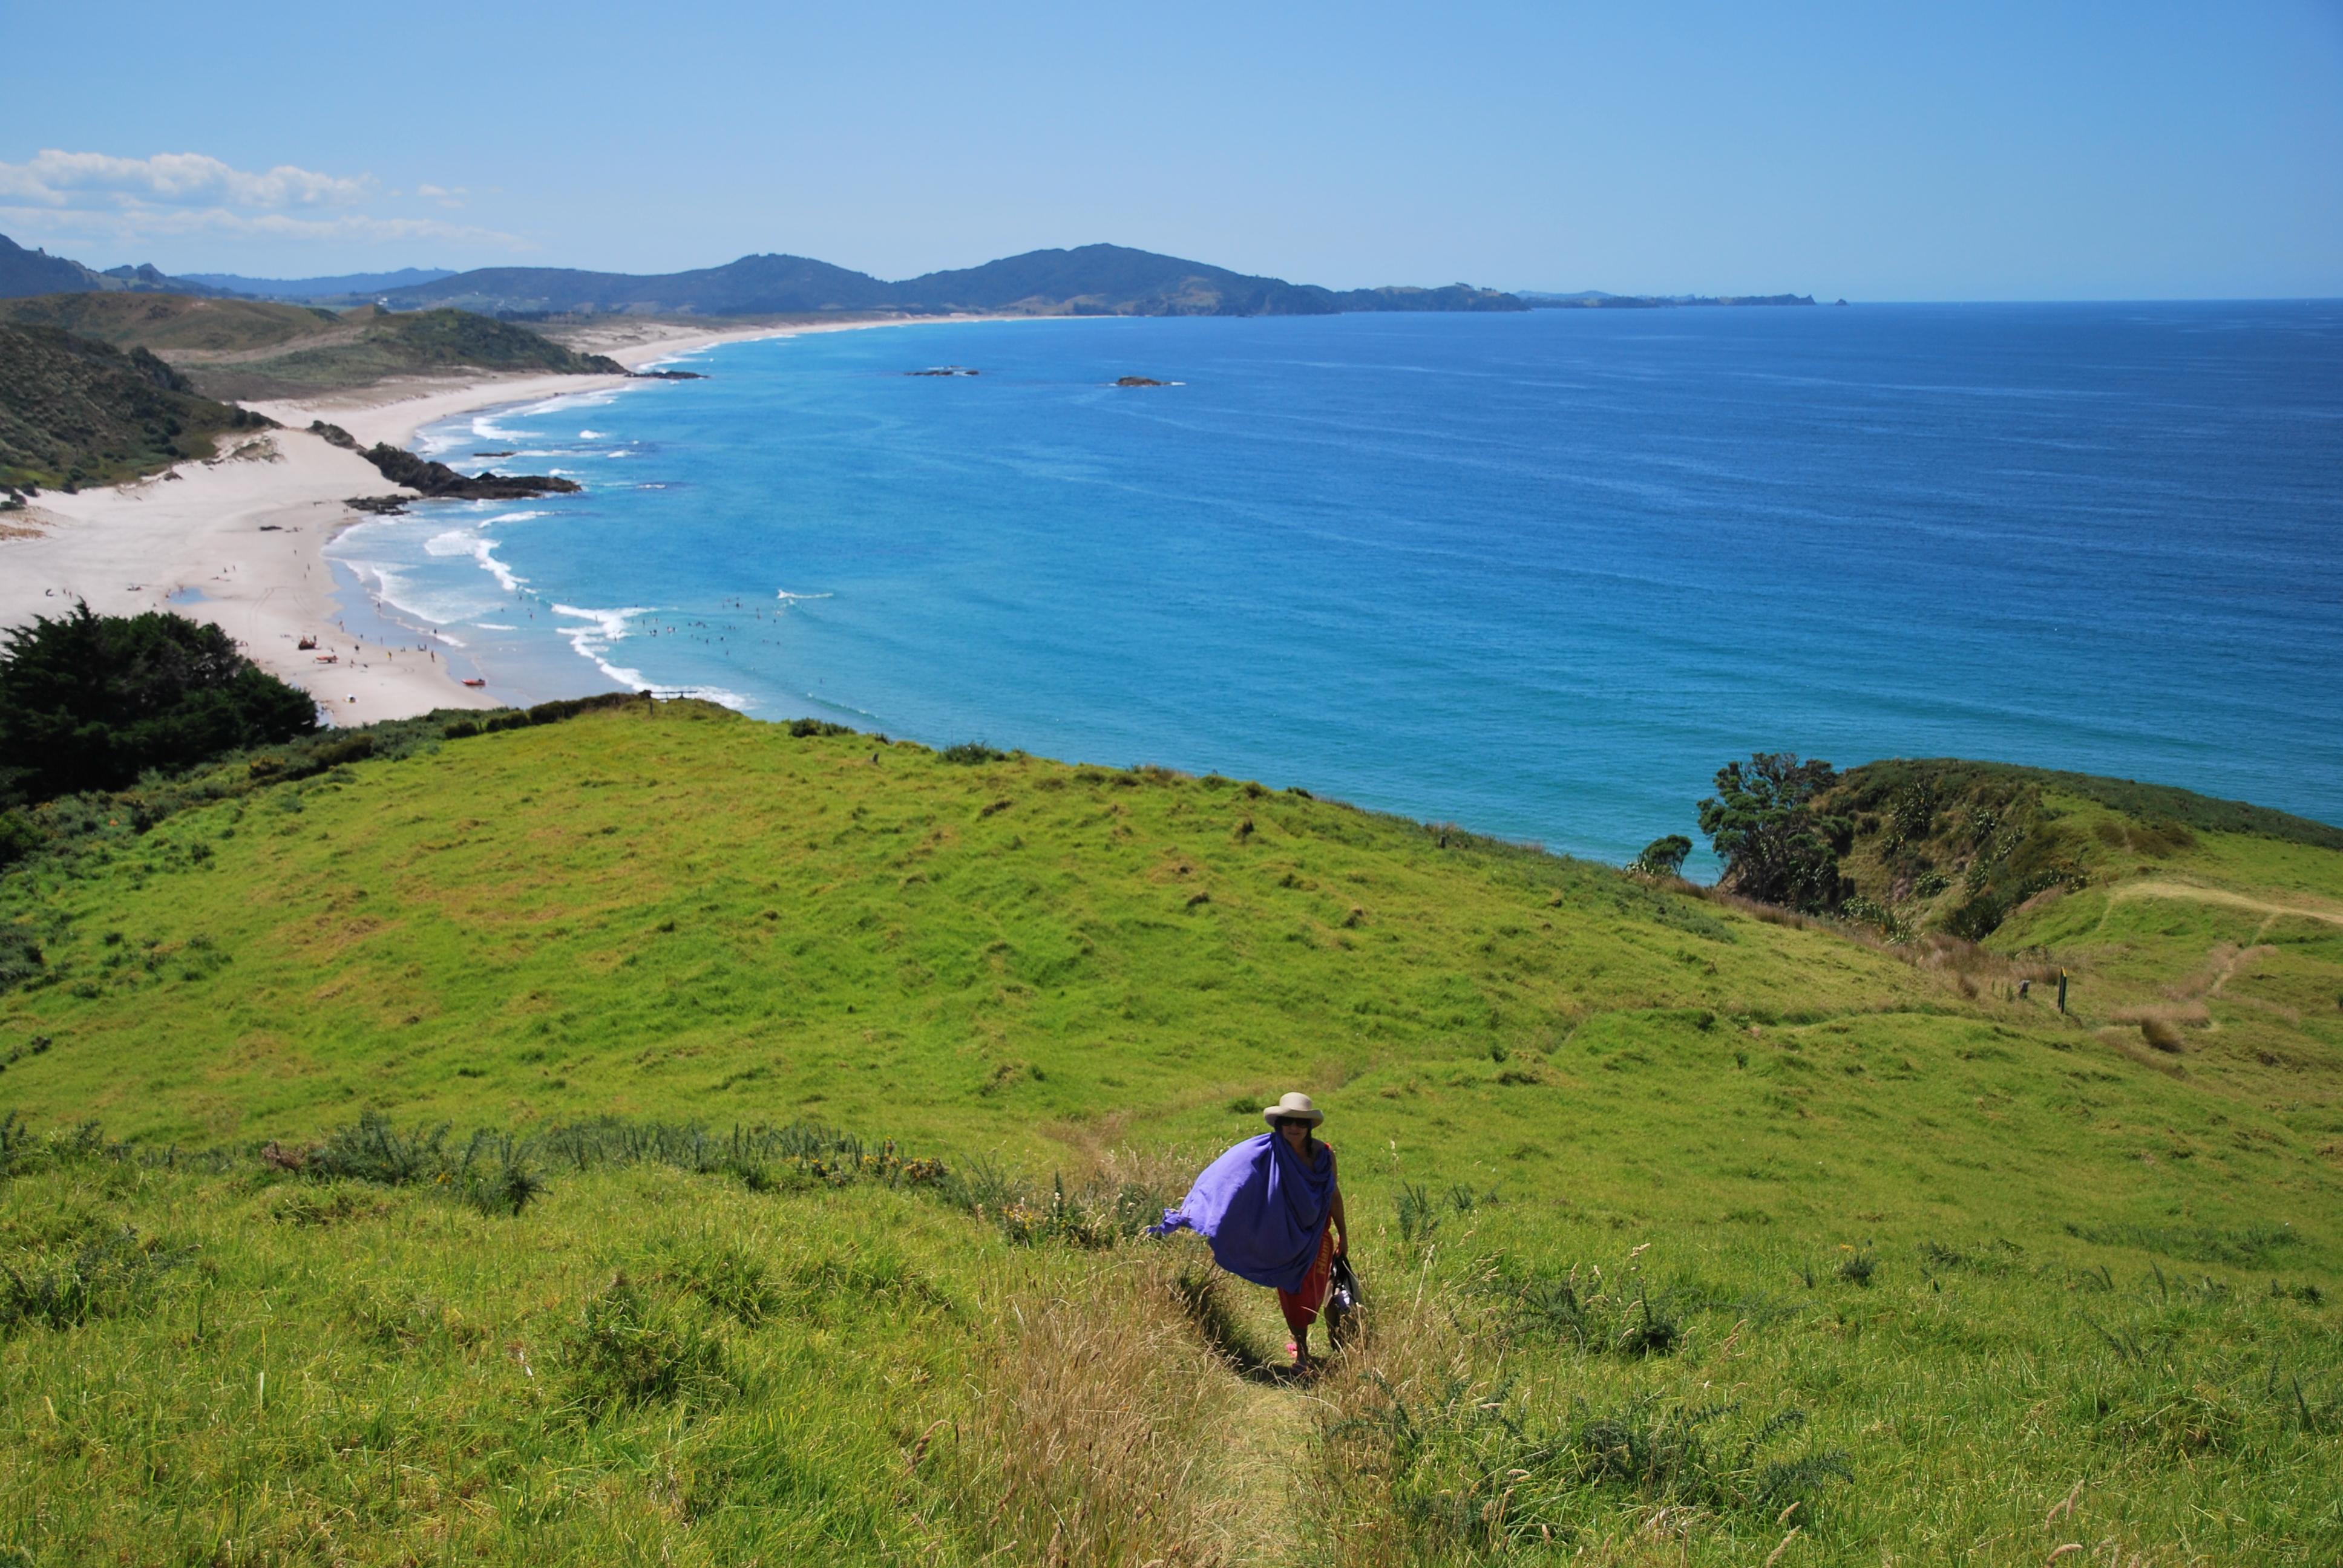 Whangarei Heads - Whangarei - New Zealand 043